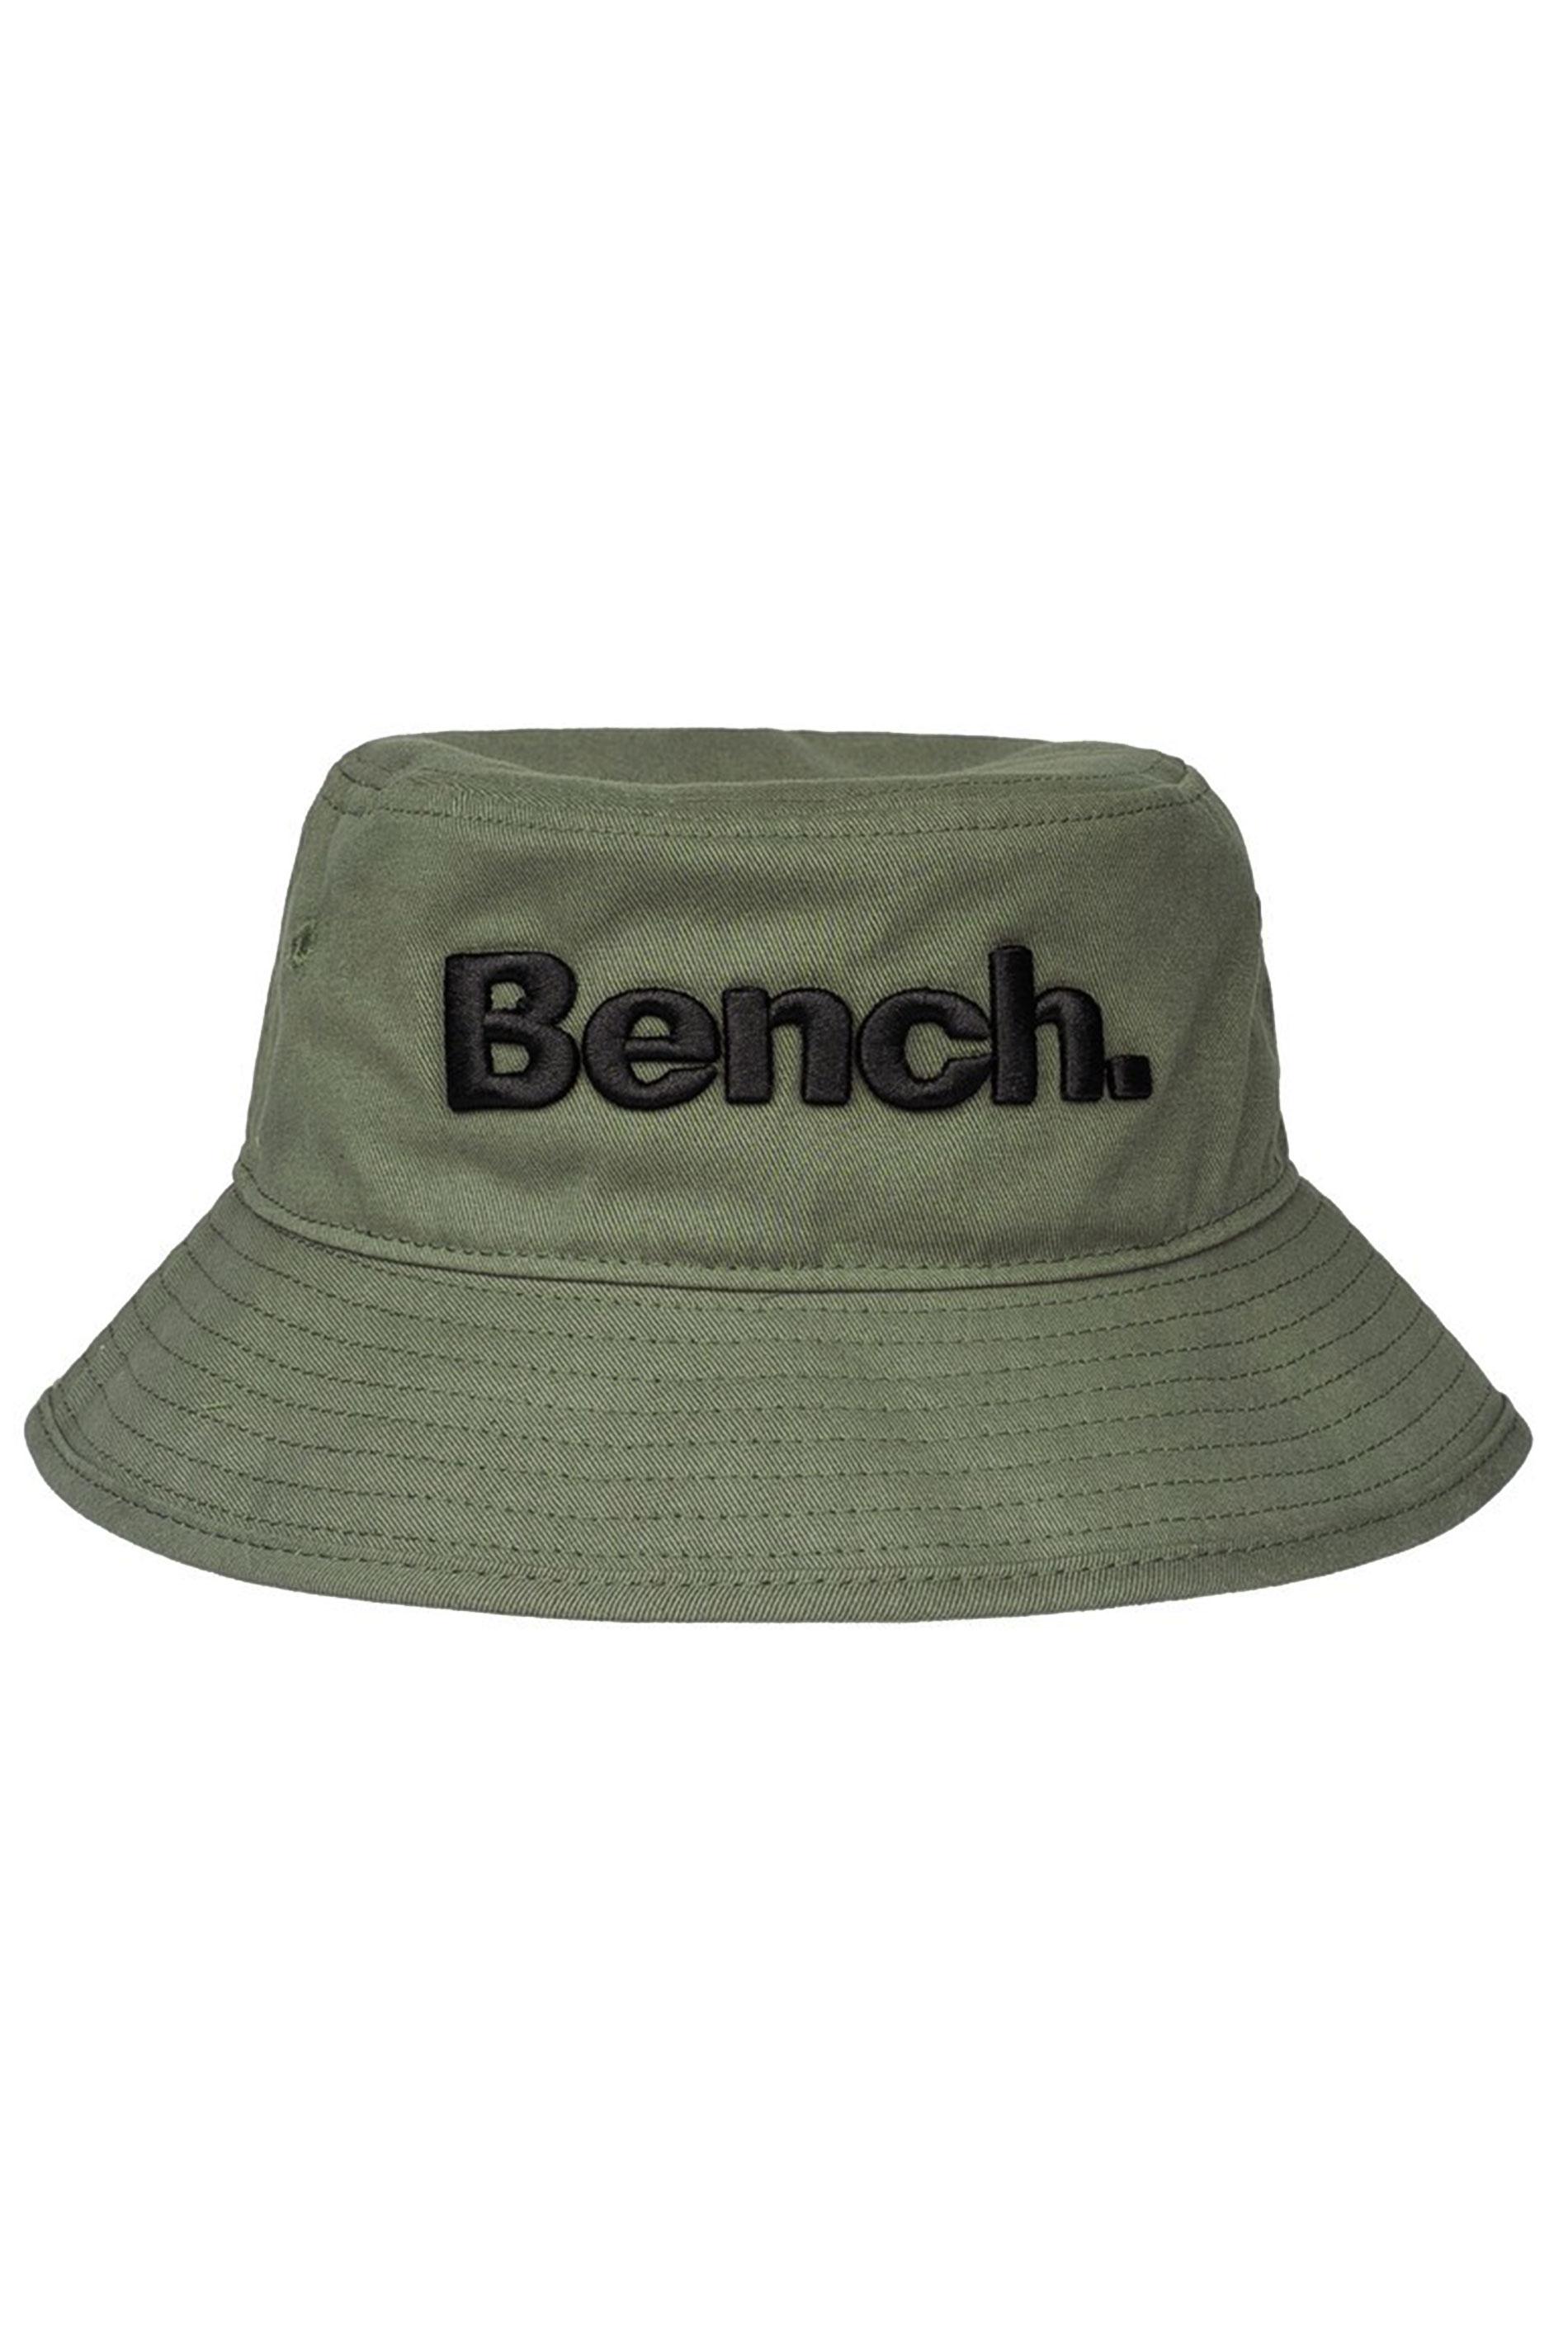 BENCH Khaki Mykonos Bucket Hat